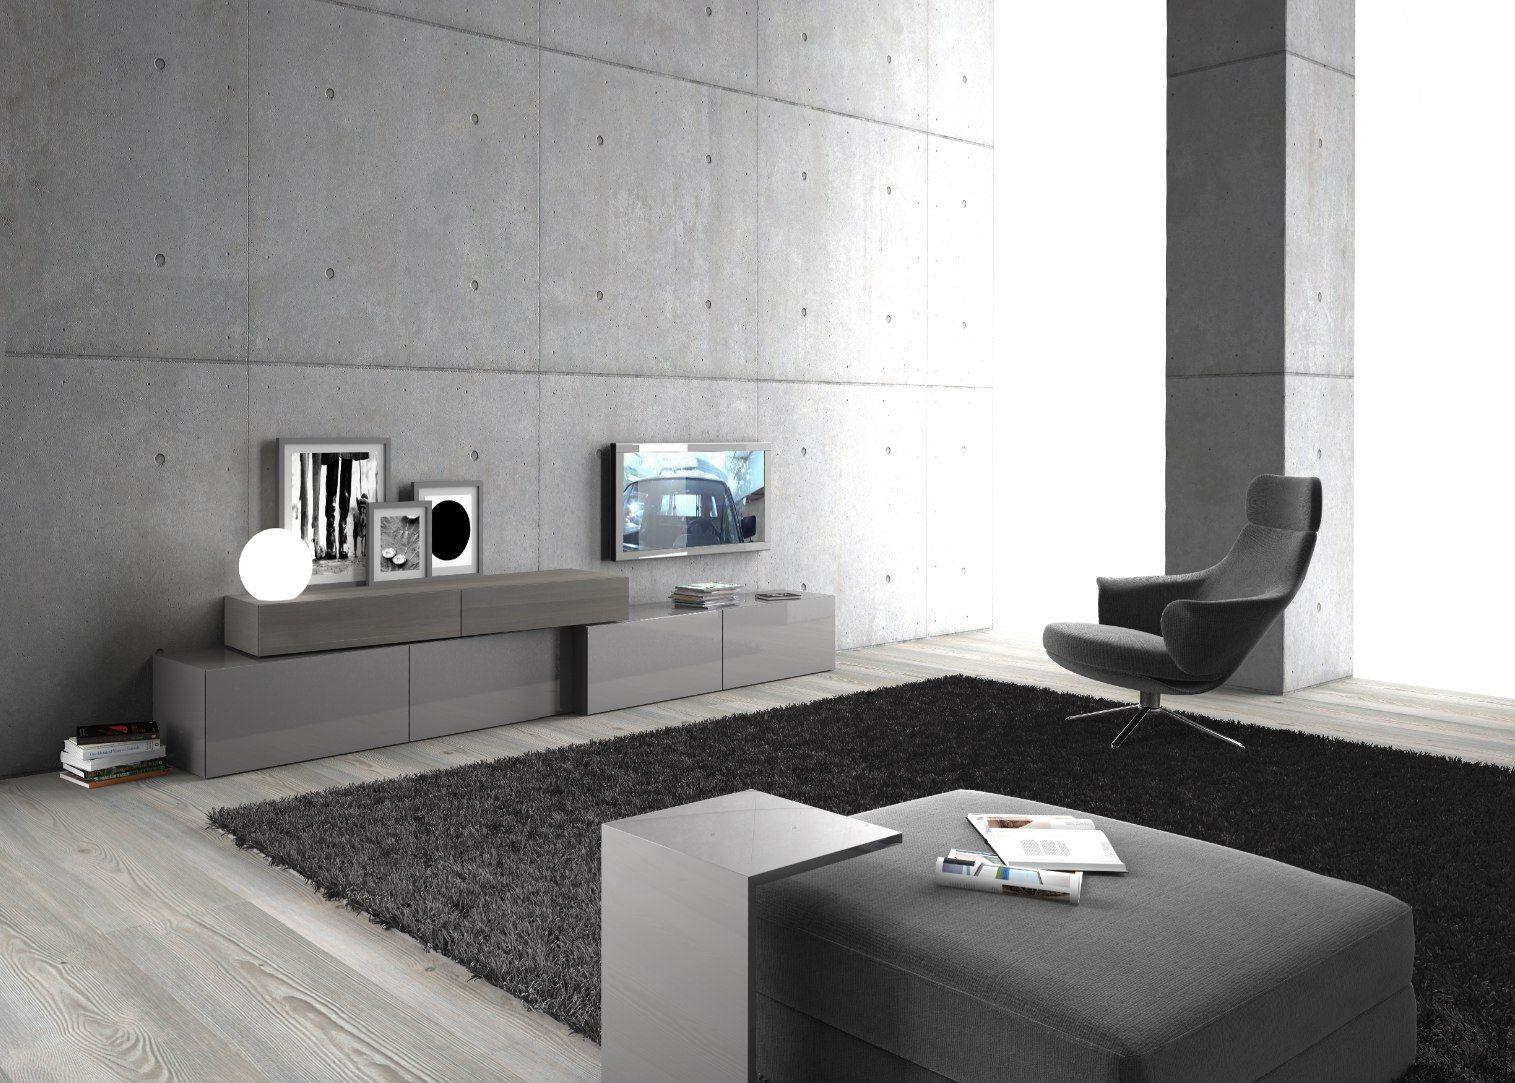 Presotto InclinArt @ Top Interieur   Eetkamers, kasten, (salon ...